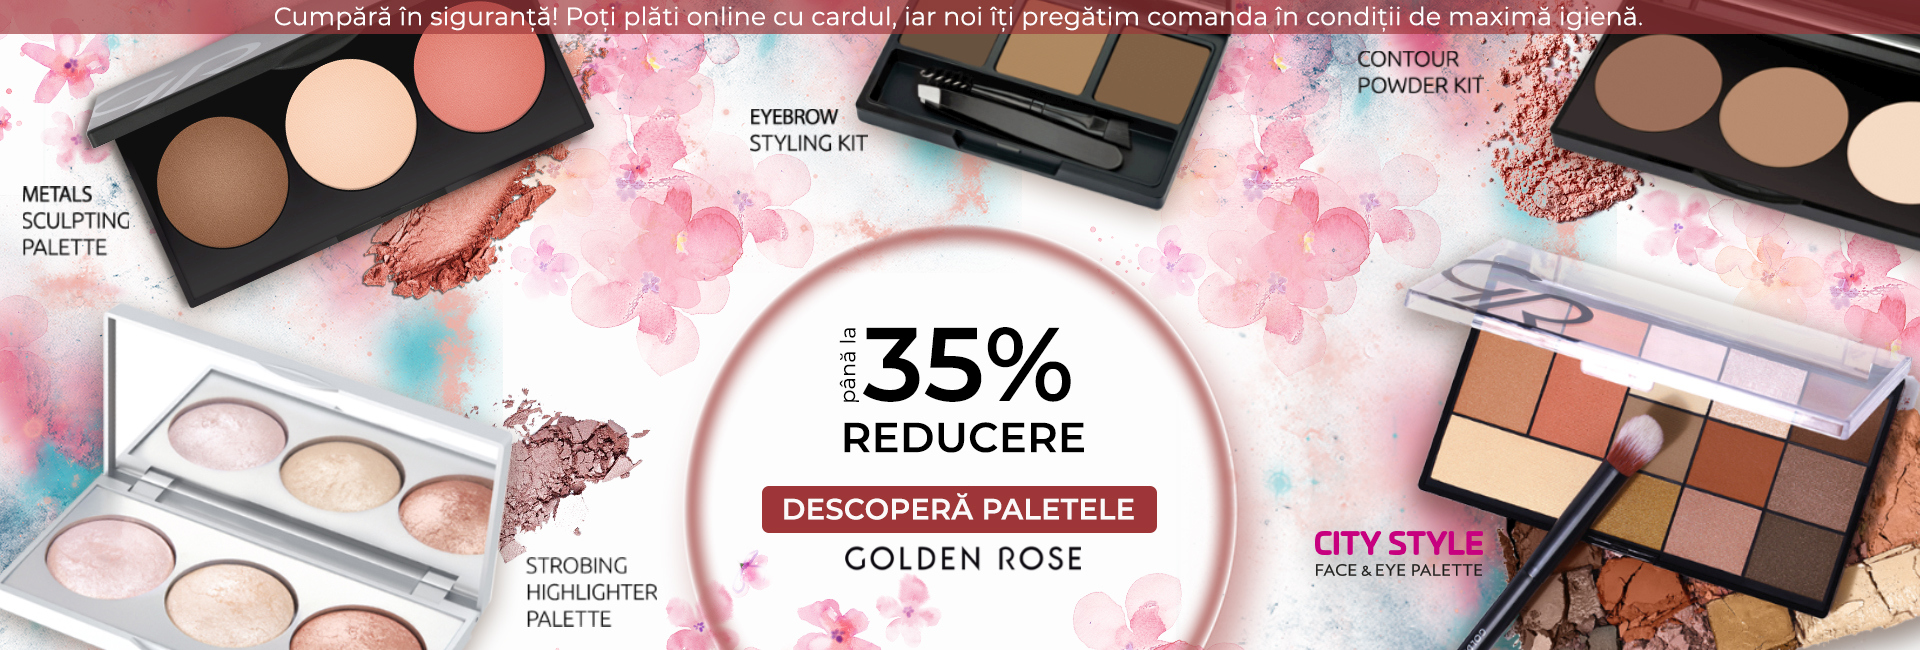 PALETE GOLDEN ROSE -35%